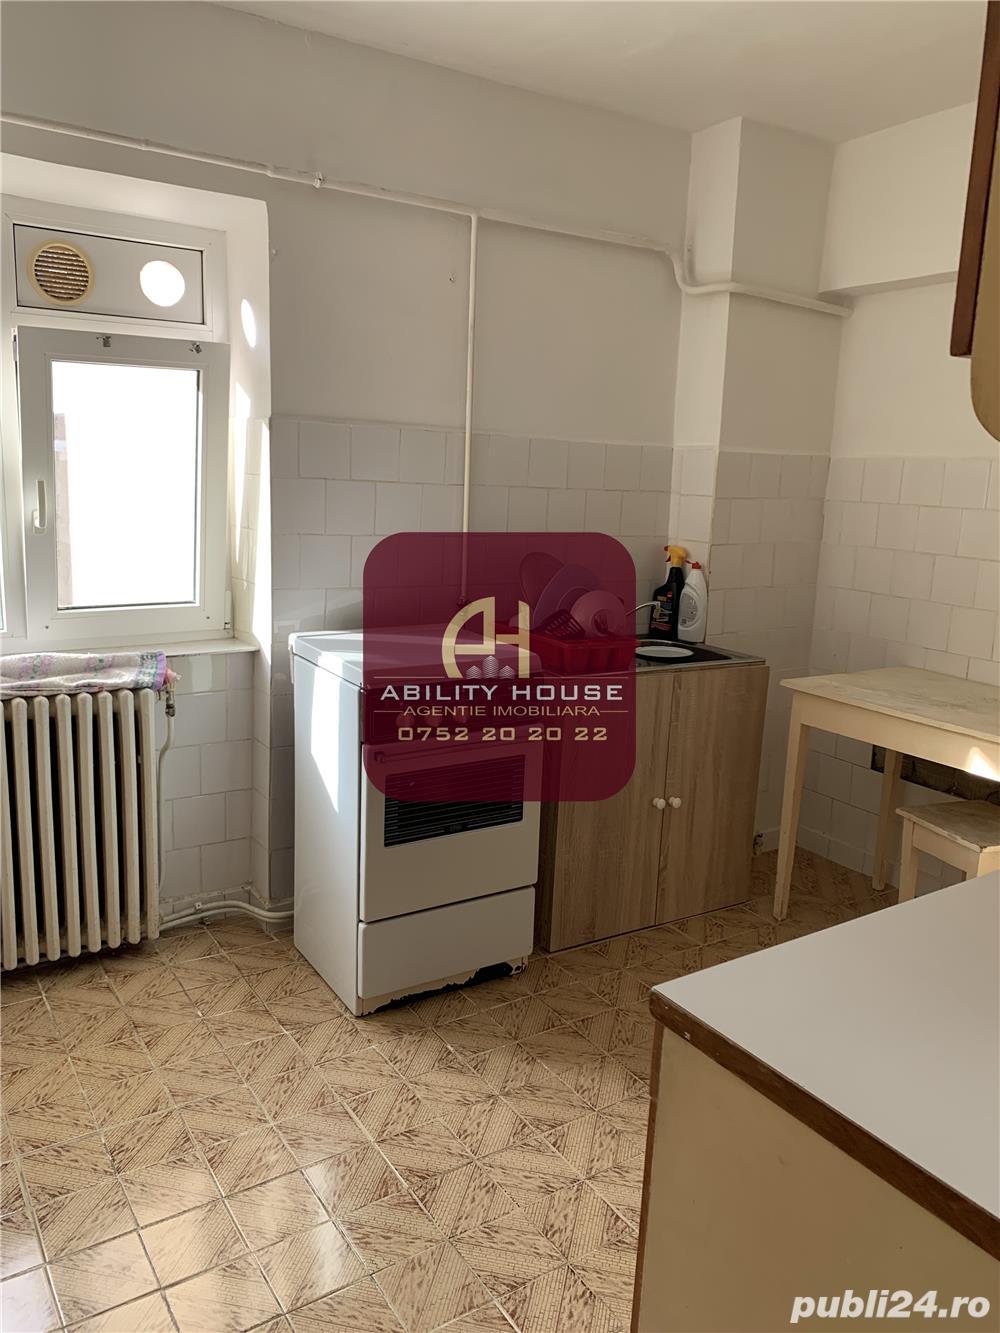 Apartament 4 camere, zona Romarta, Botosani.